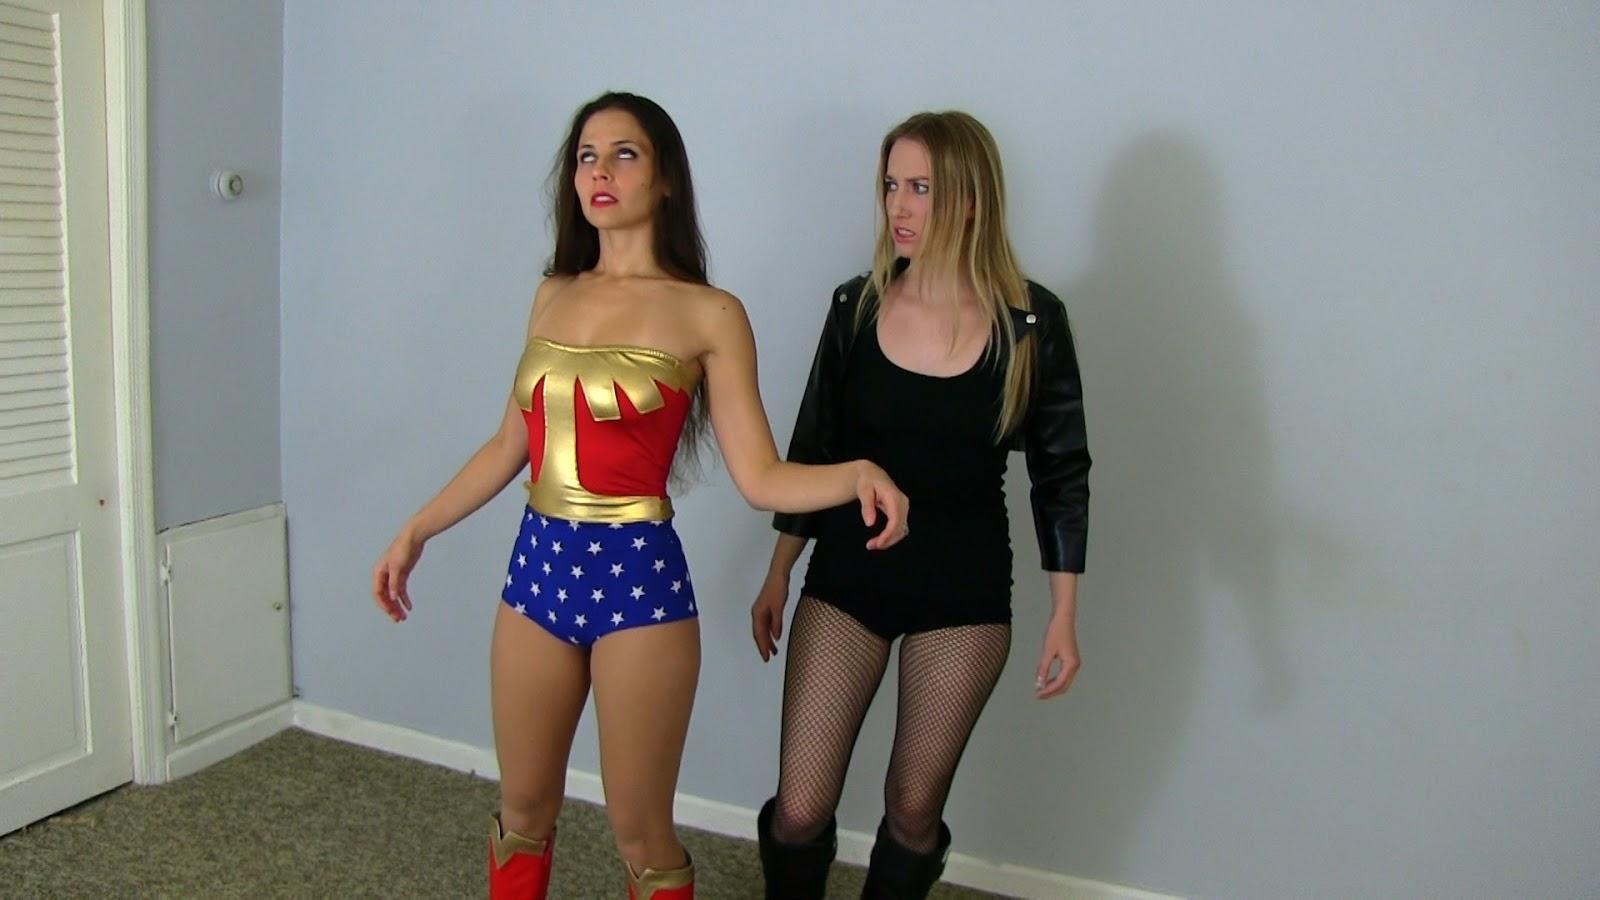 Bondage Super Heroine Struggling